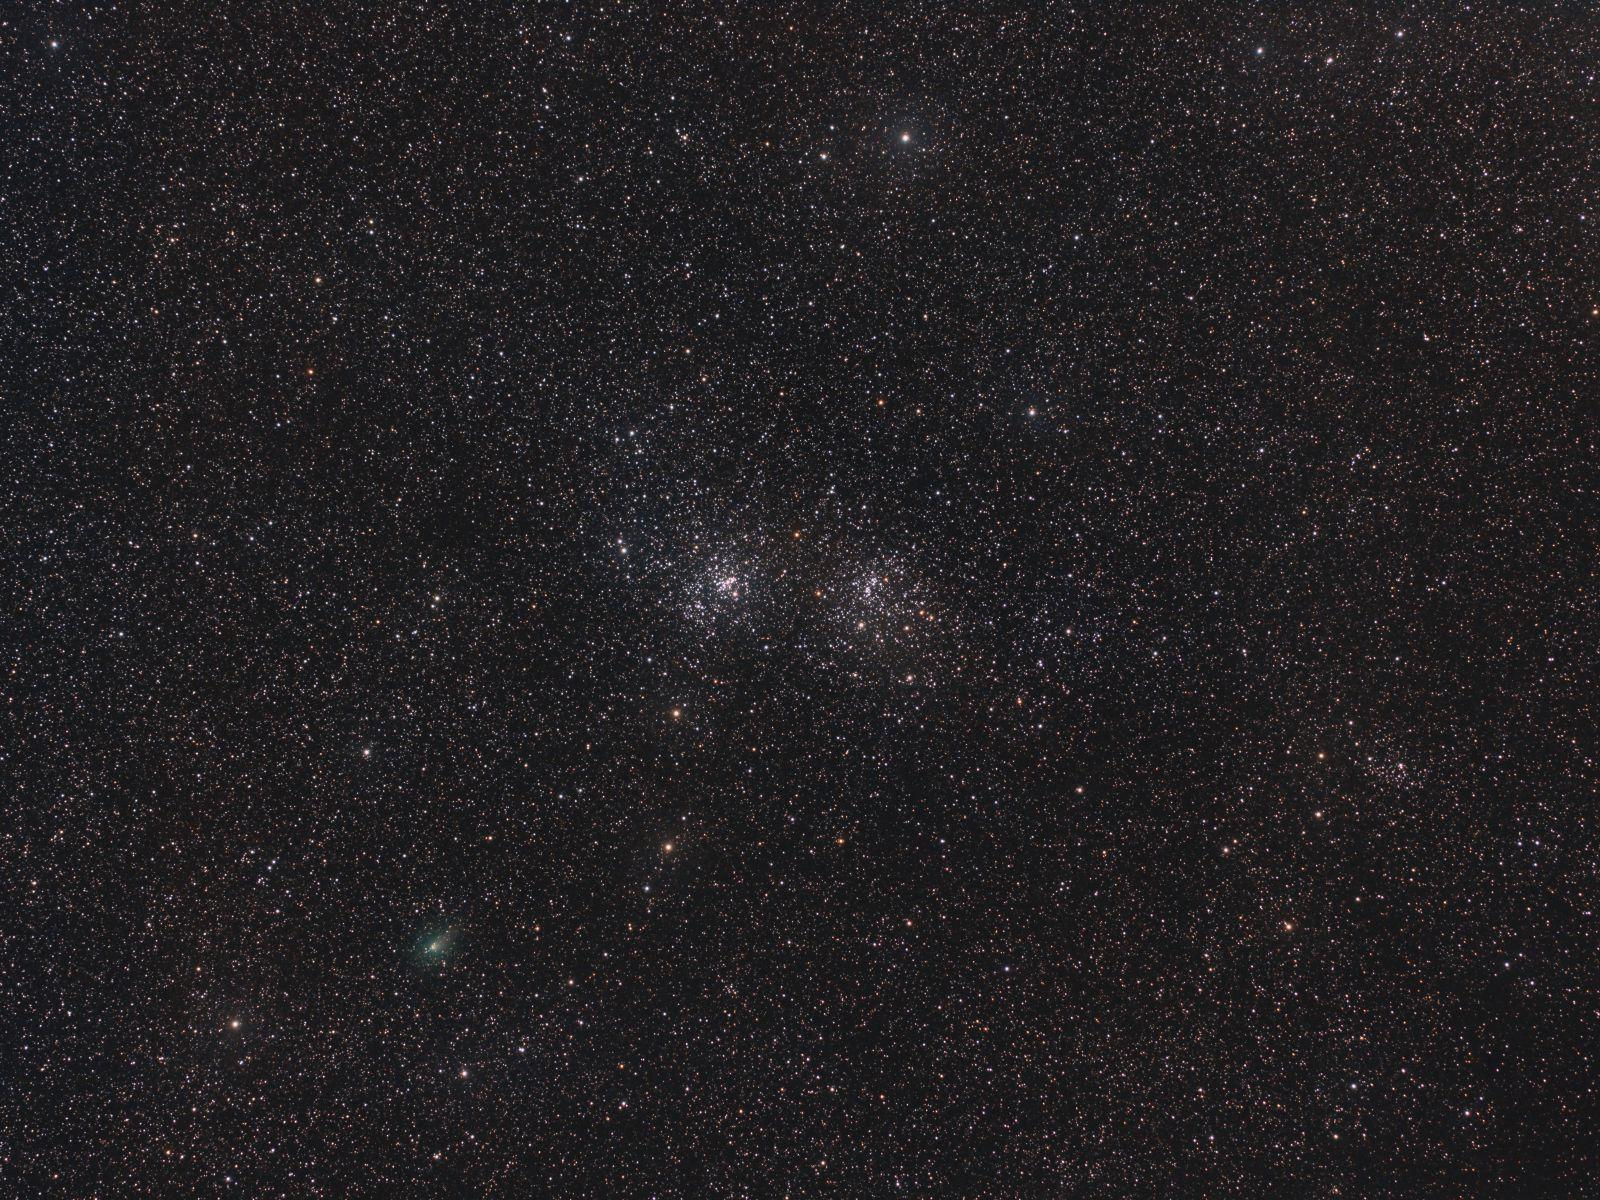 Double Cluster and Comet PANSTARRS C/2017 T2